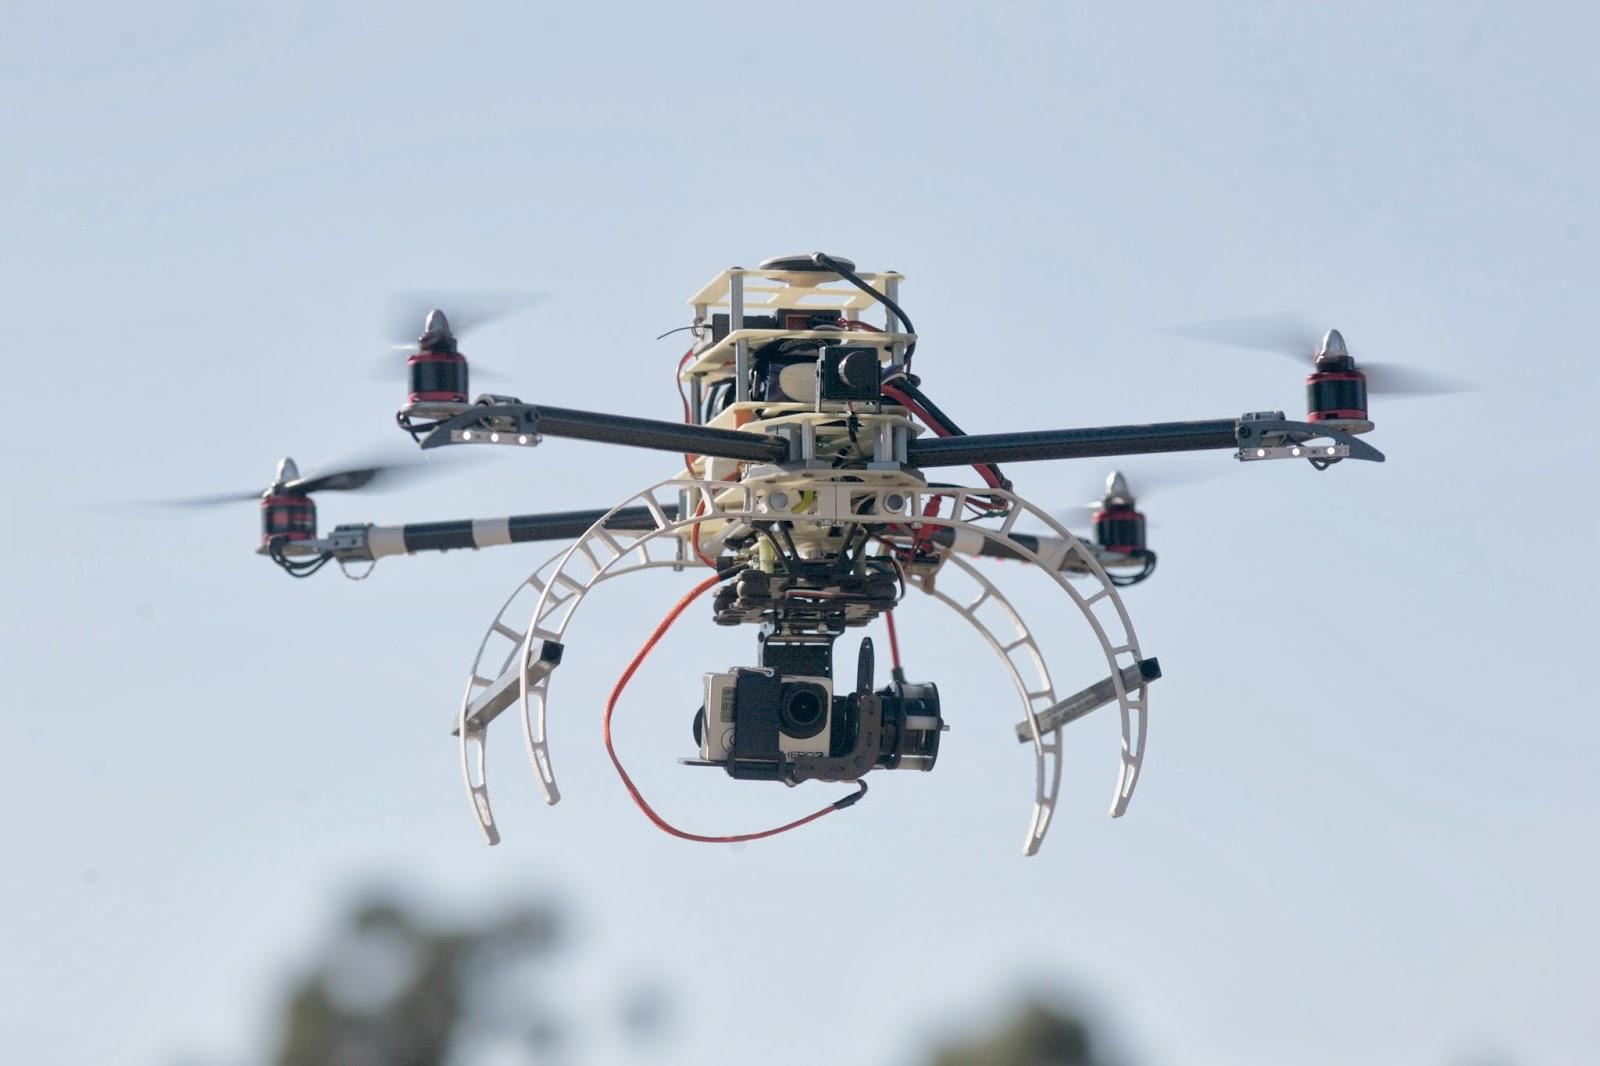 drones02.jpg